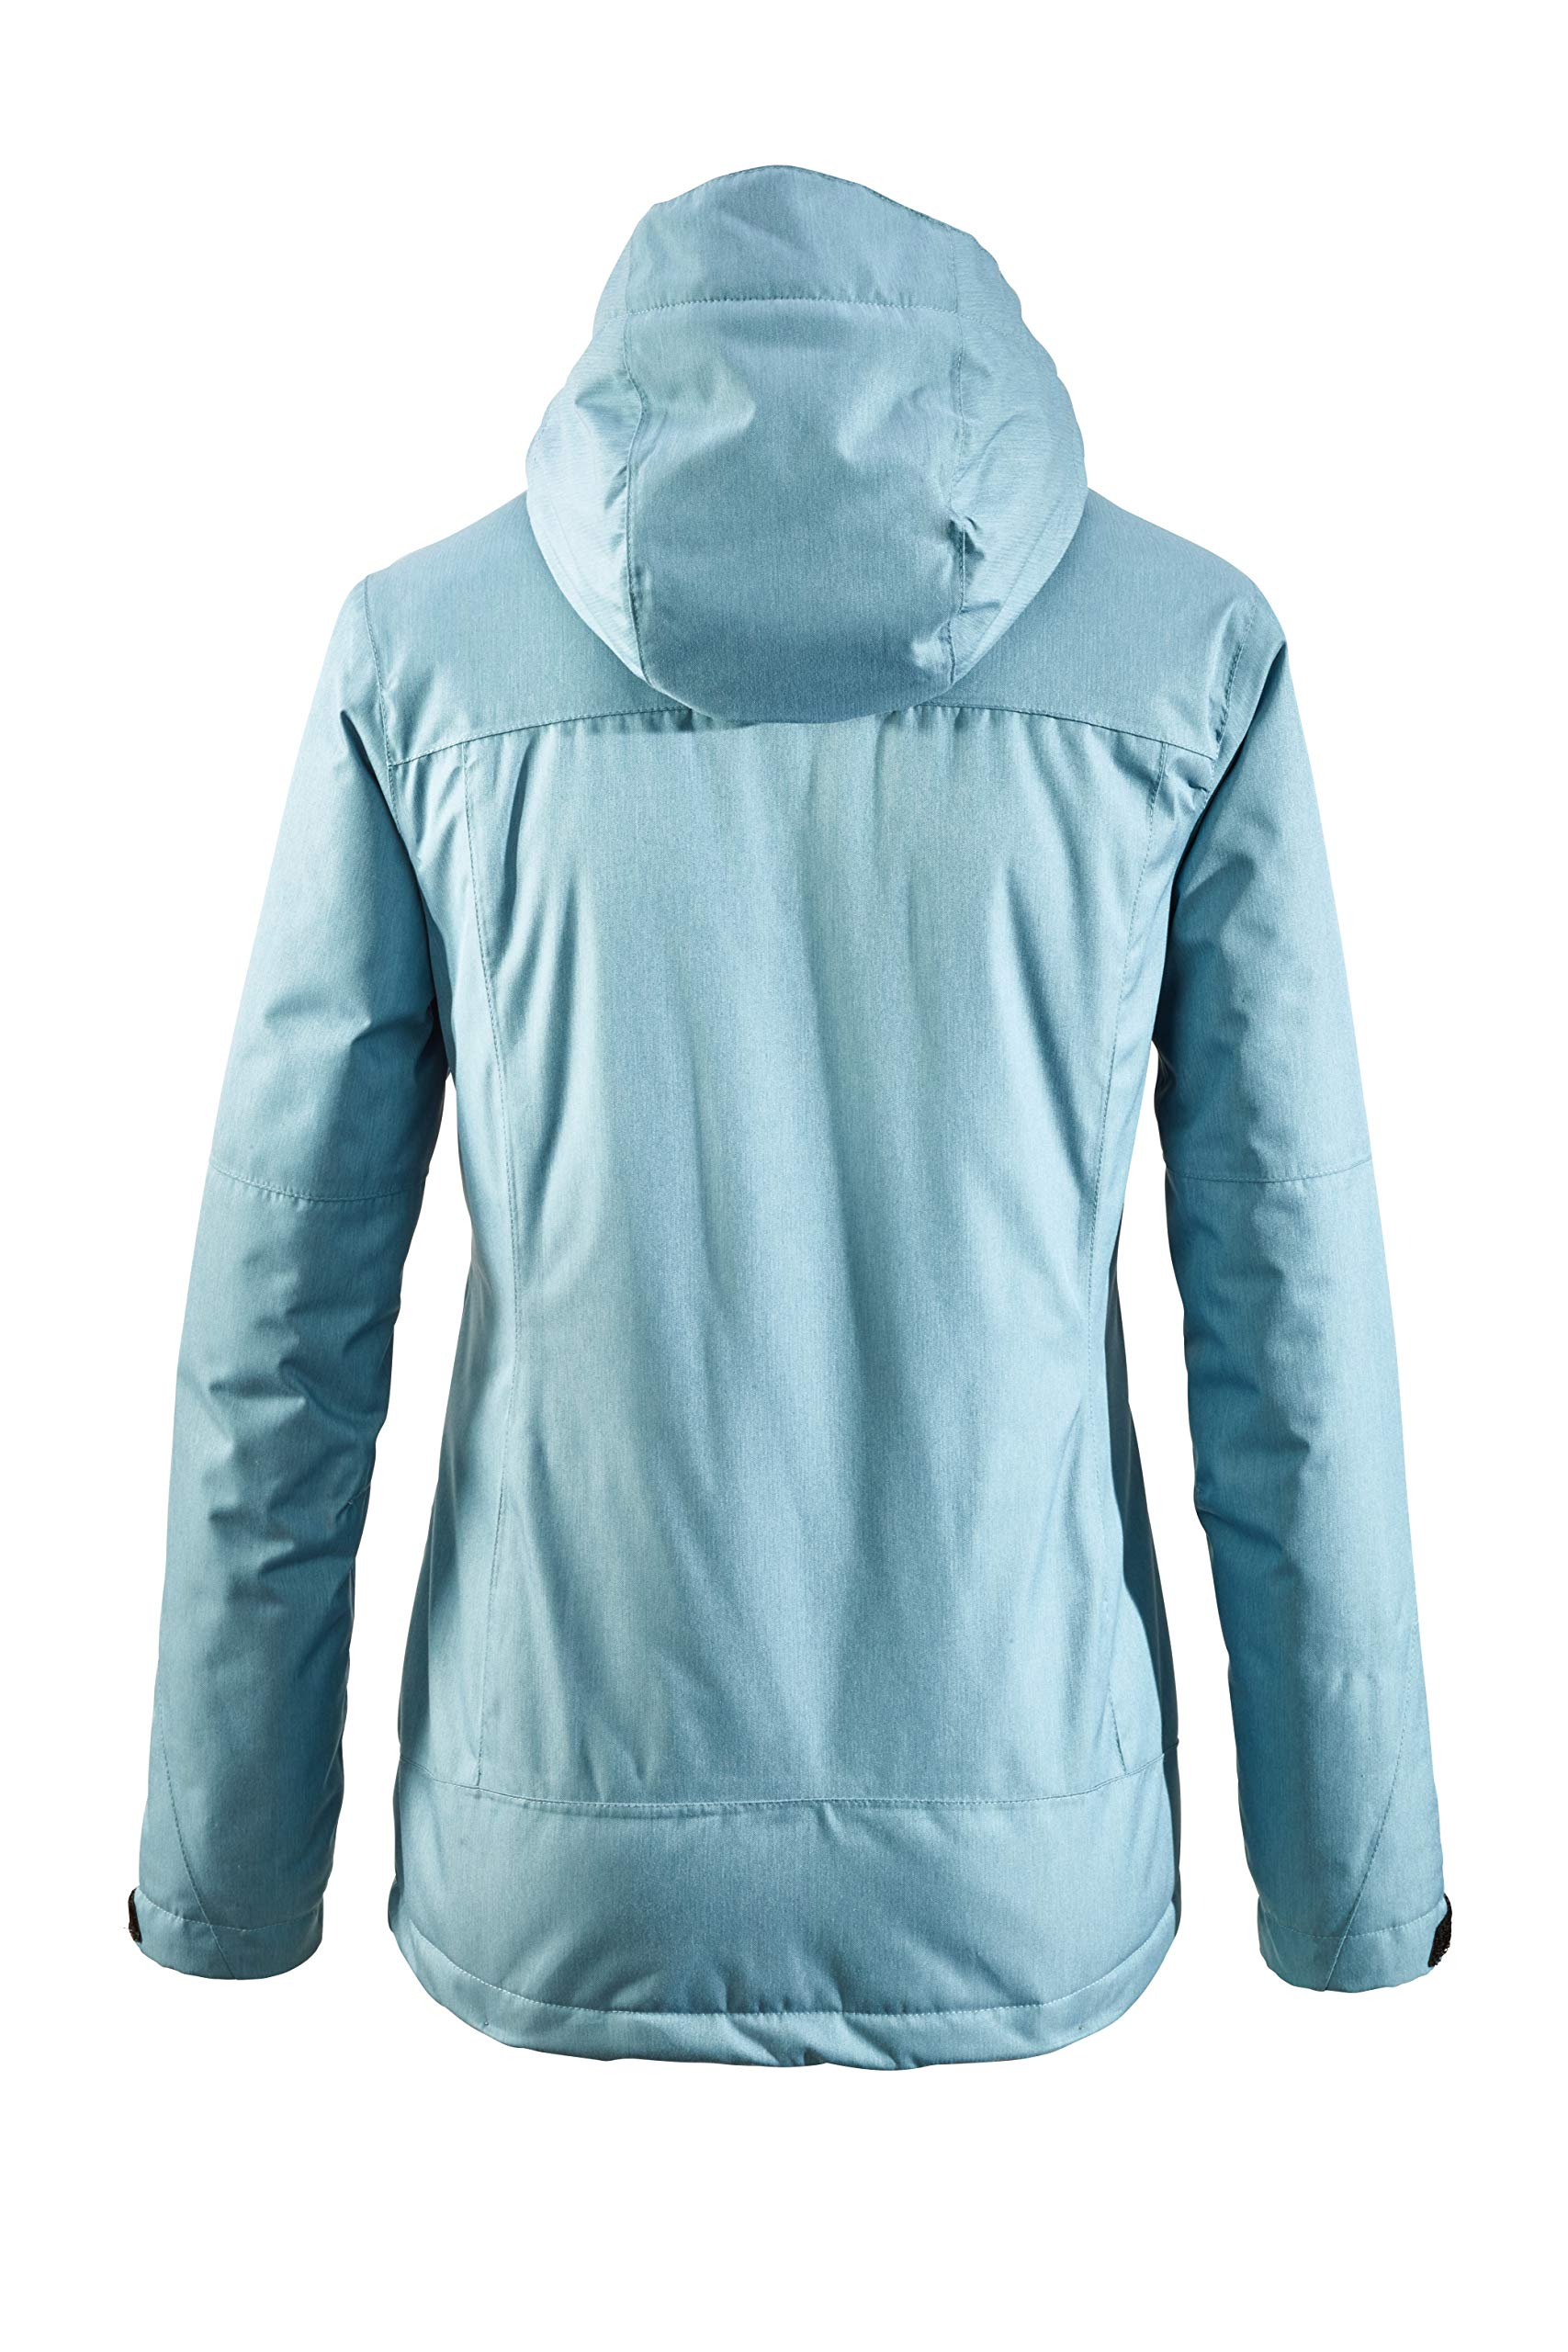 81ScqLavXhL - killtec Women's Zala Functional Jacket with Zip-Off Hood